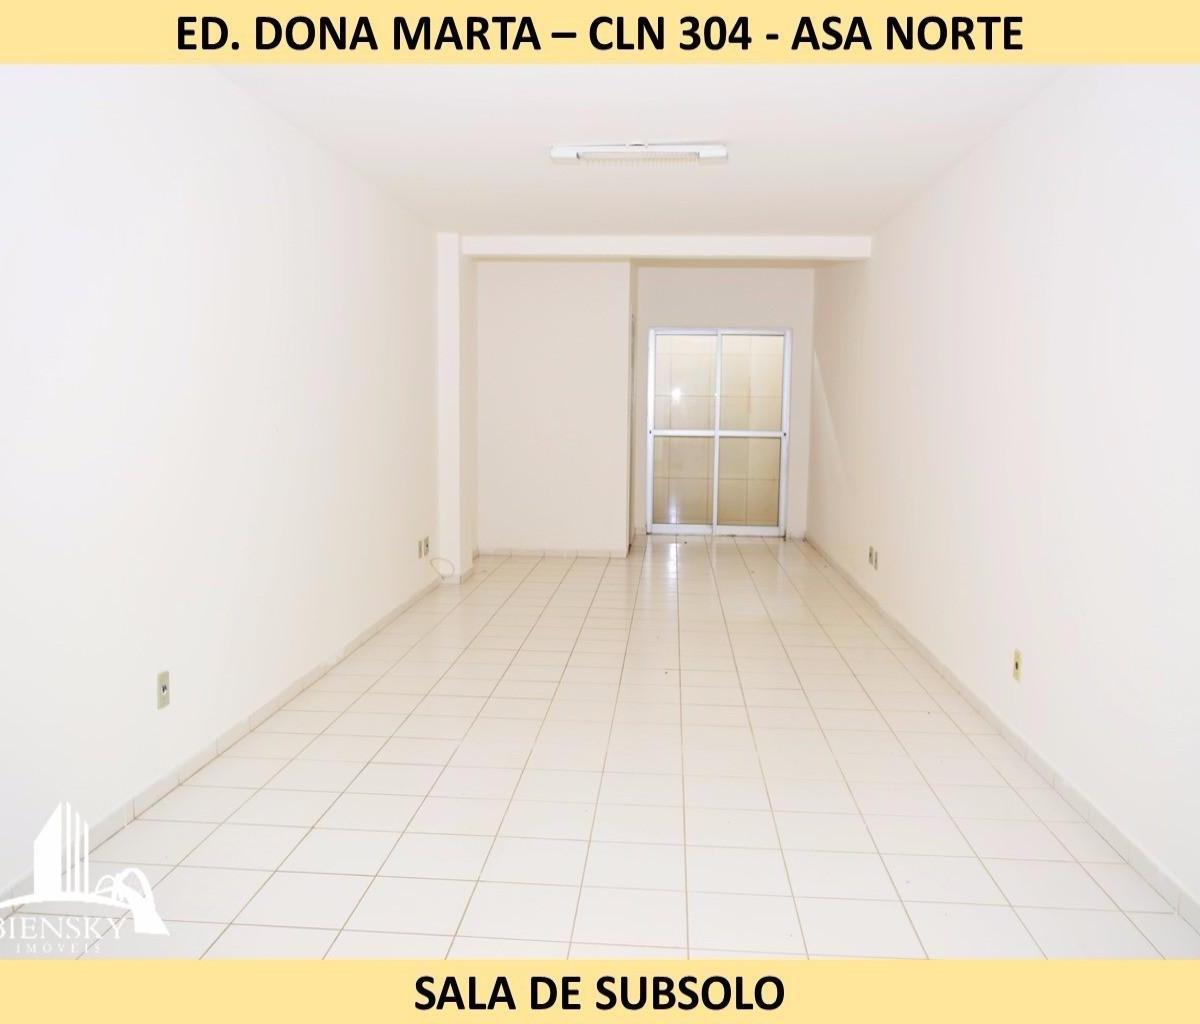 Imagens de #B48B17 cln 304 bloco d loja de subsolo cln 304 bloco d asa norte brasília 1200x1024 px 3346 Bloco De Cad Banheiro Publico